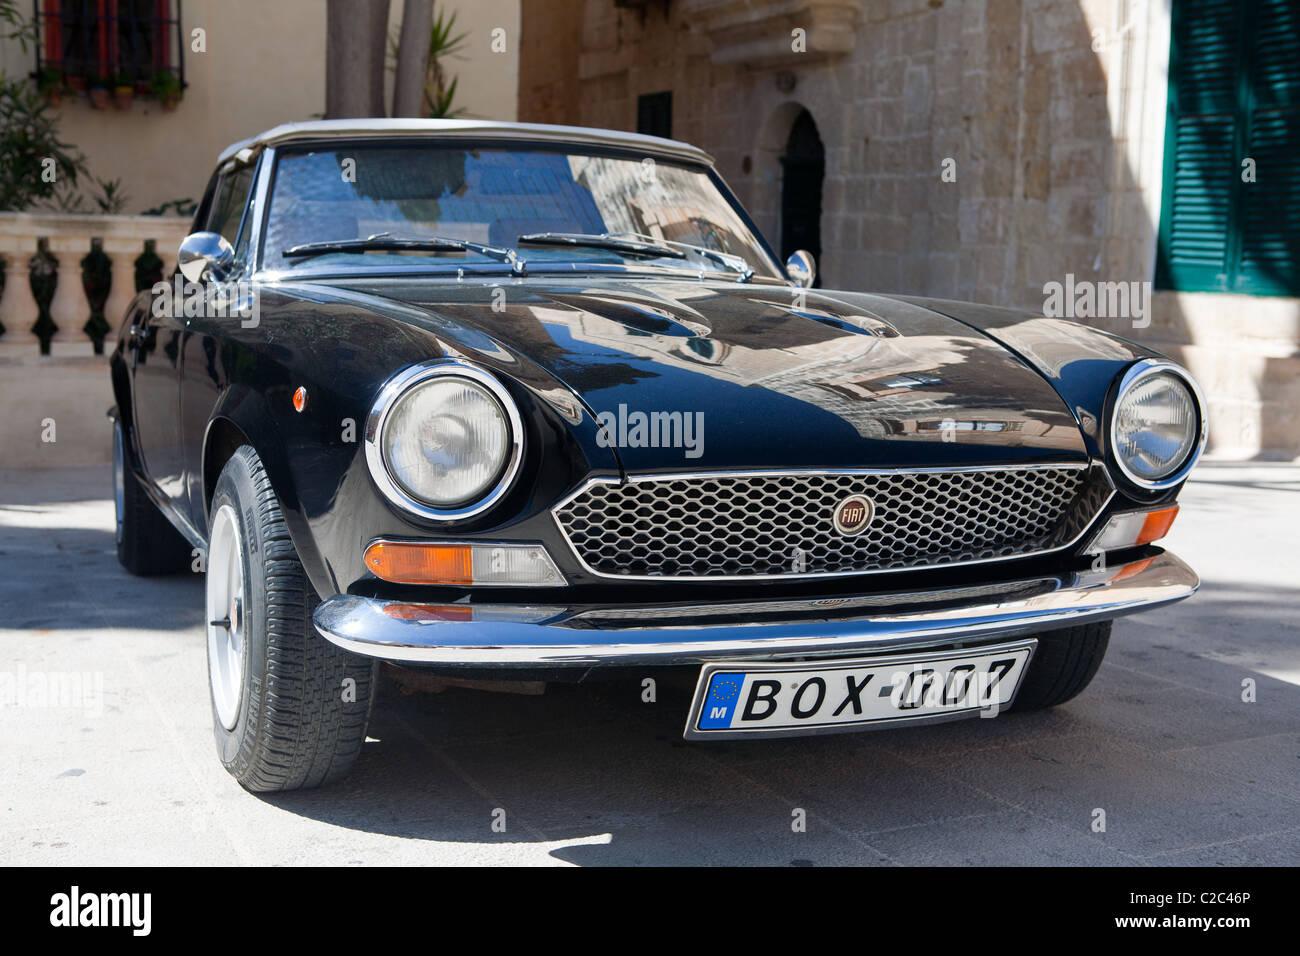 A Classic Fiat Sports Convertible Car Stock Photo 35916798 Alamy